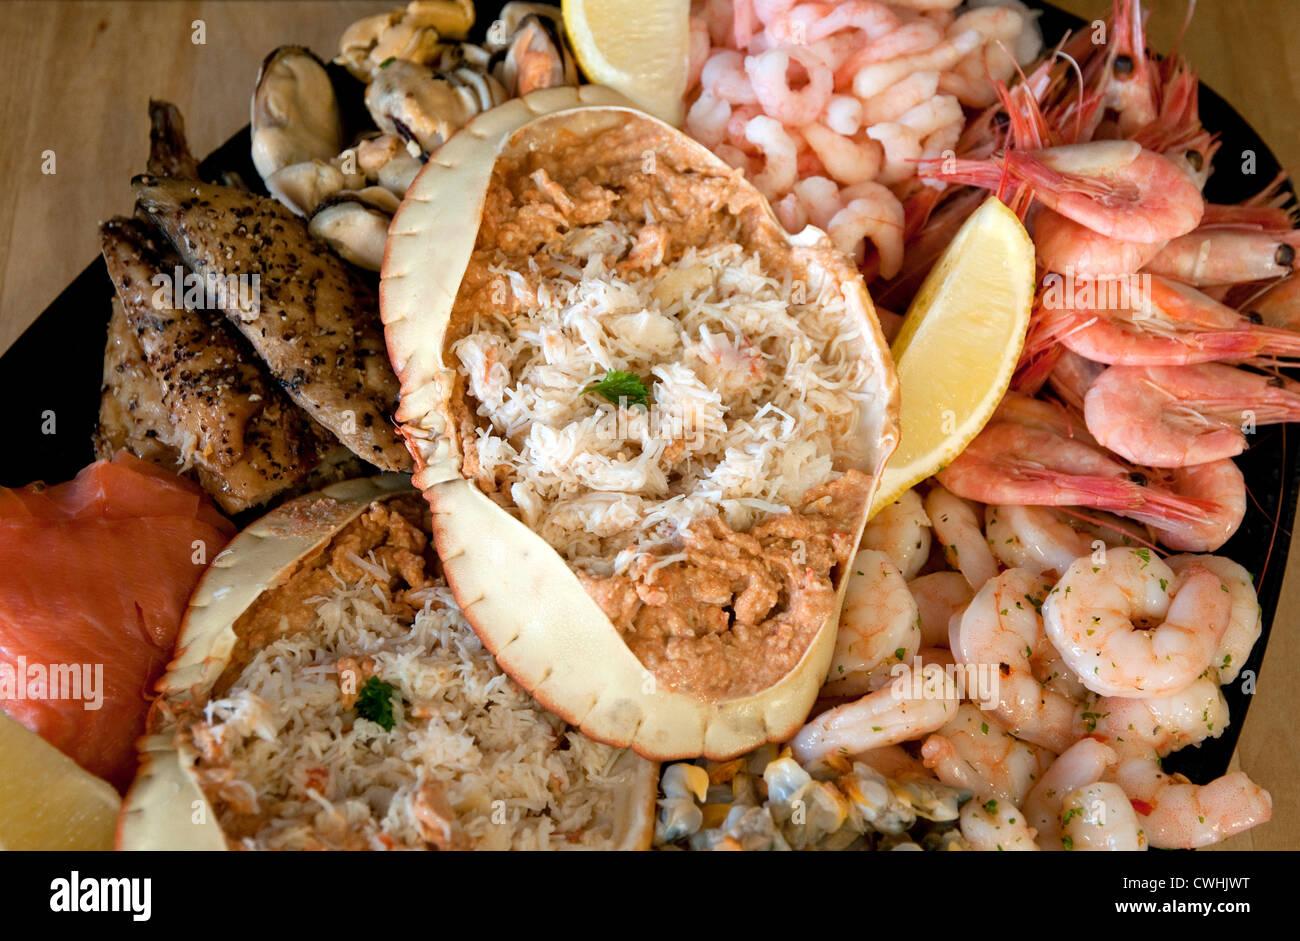 seafood platter, west mersea, essex, england - Stock Image